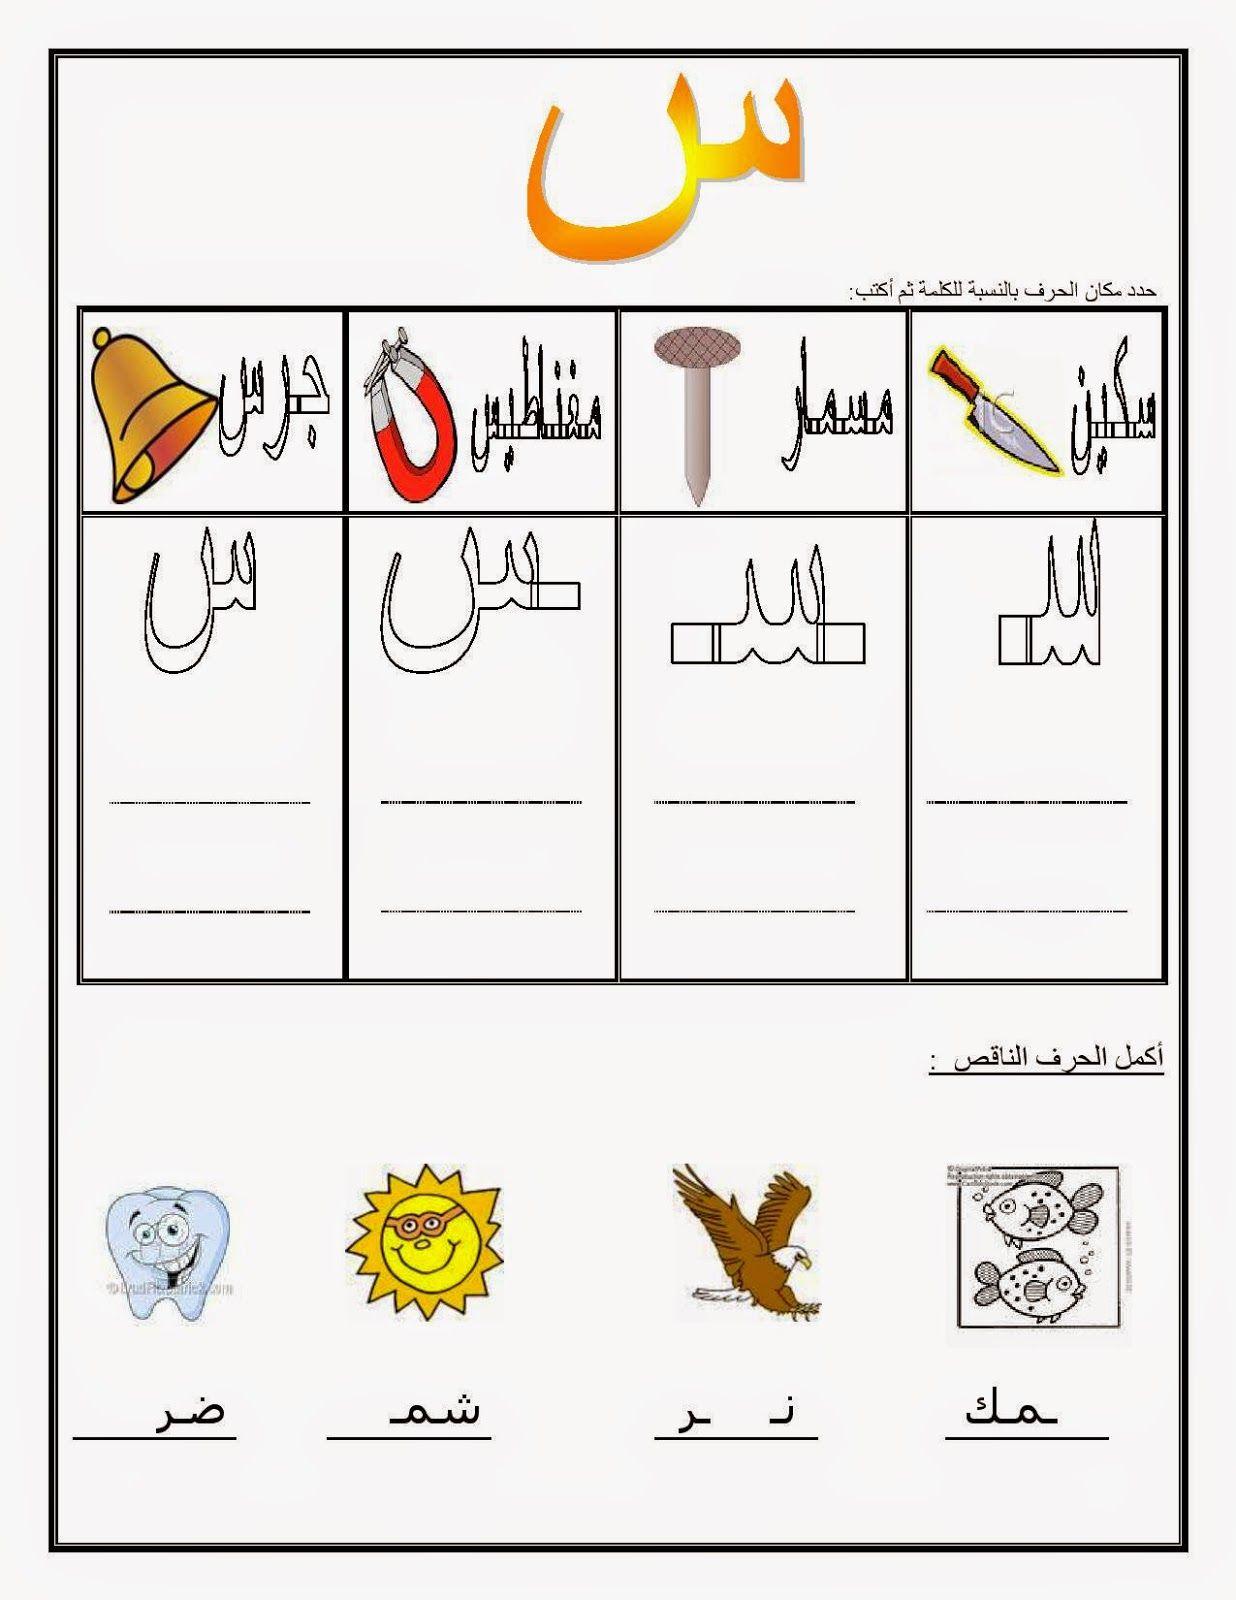 pin by fufa hussein on pic arabic verbs learning arabic arabic alphabet. Black Bedroom Furniture Sets. Home Design Ideas